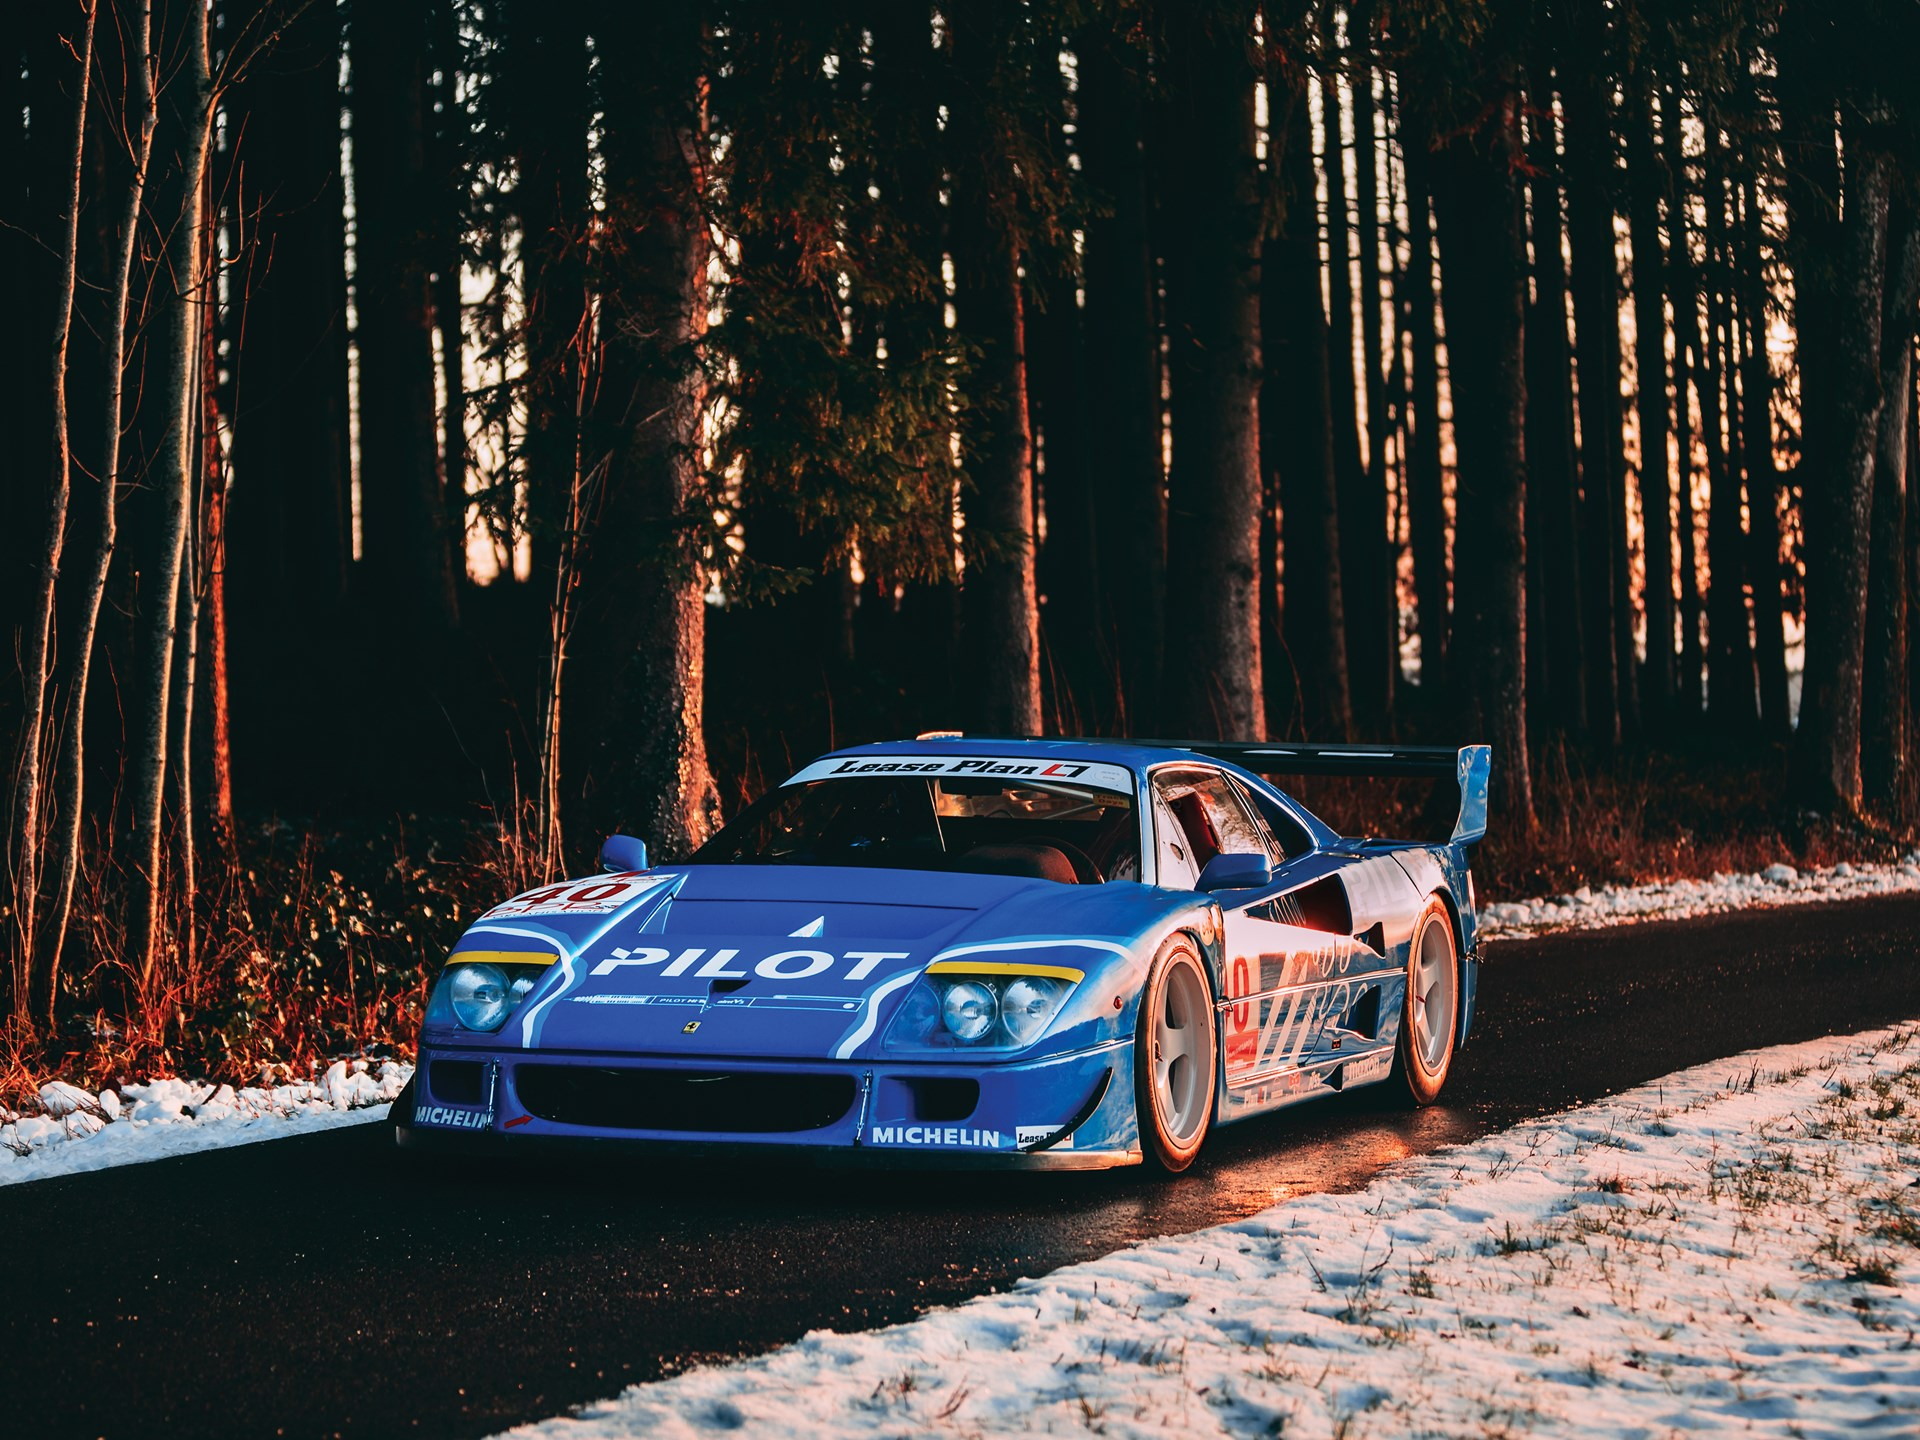 1987 Ferrari F40 LM 3/4 front snow sunset